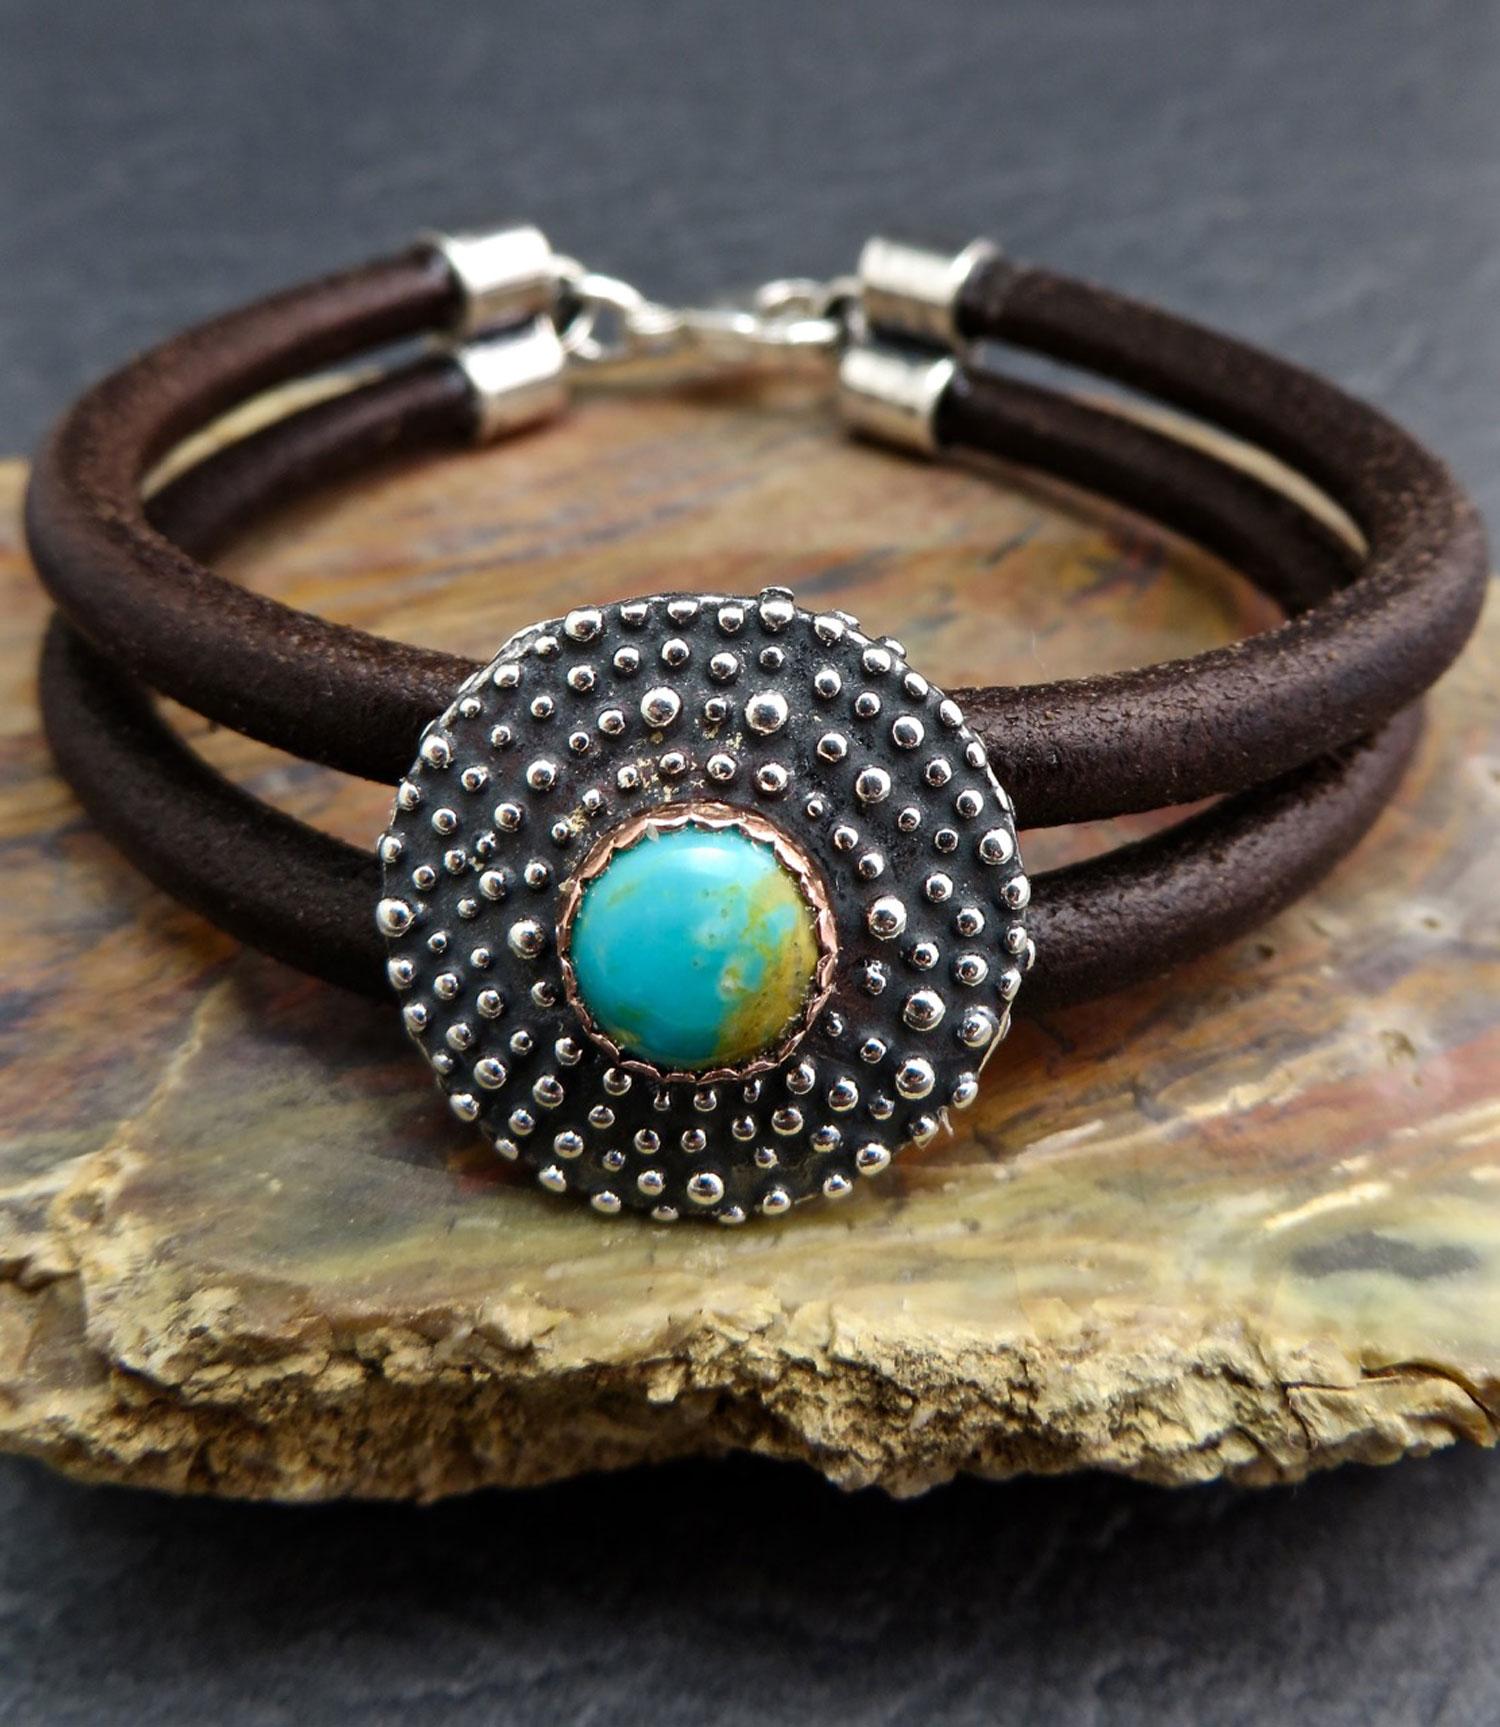 Granulated Concho Double Strand Leather Bracelet Custom Handmade Jewelry Earrings Necklaces Prescott AZ